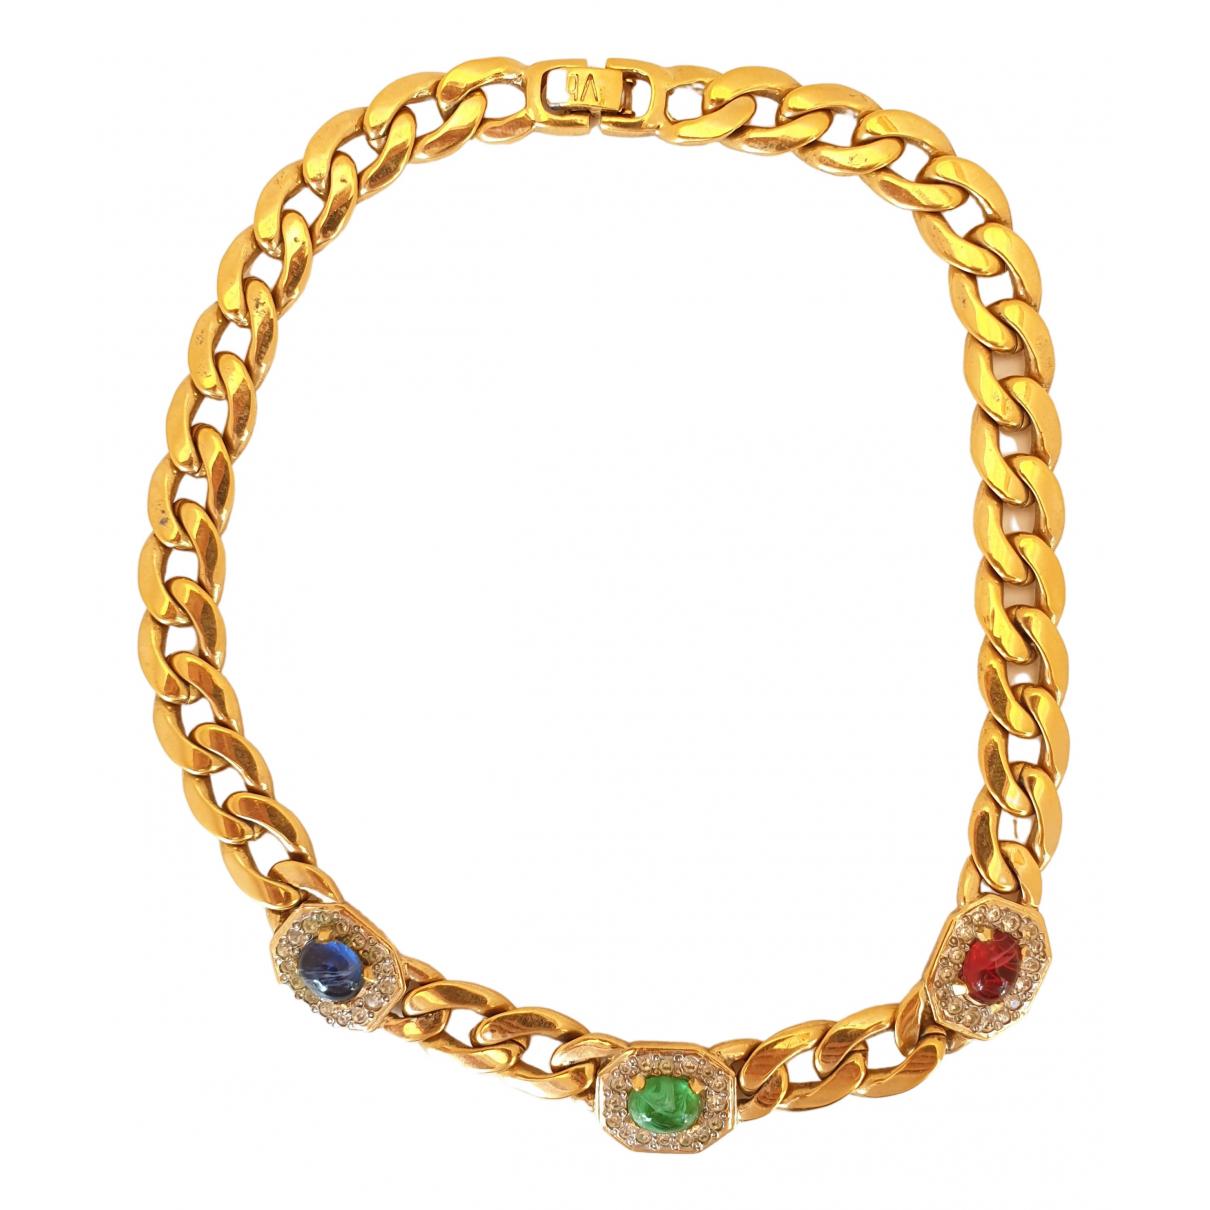 Vogue \N Kette in  Gold Metall